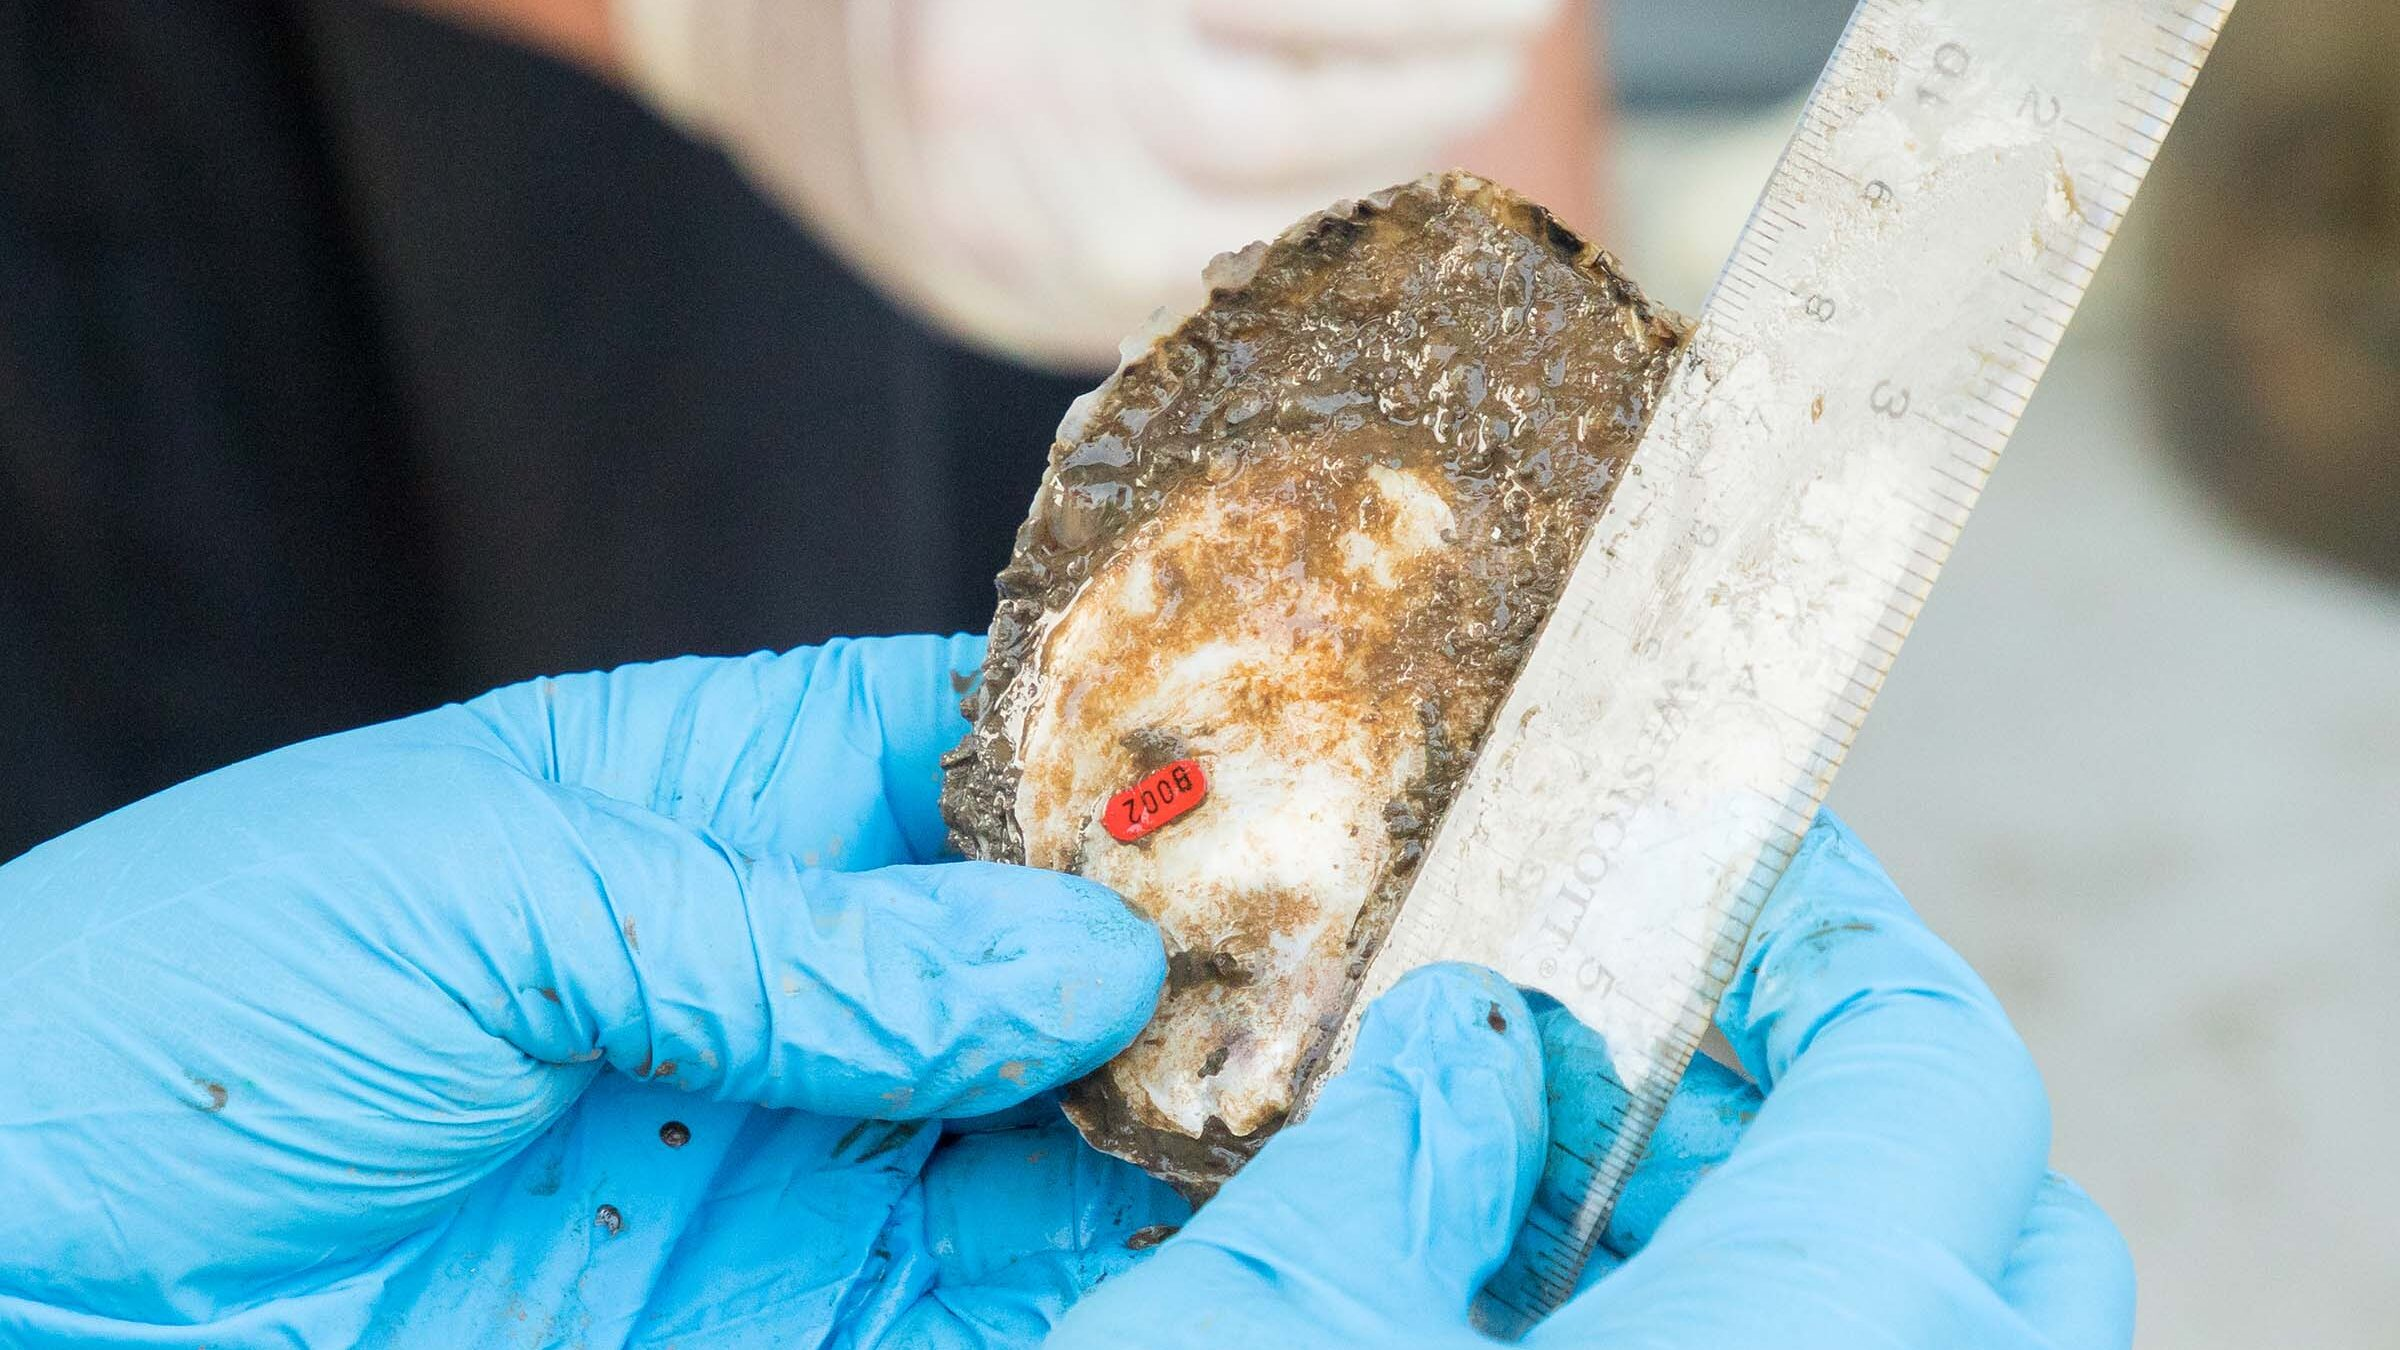 Hudson River Park educator measures an oyster